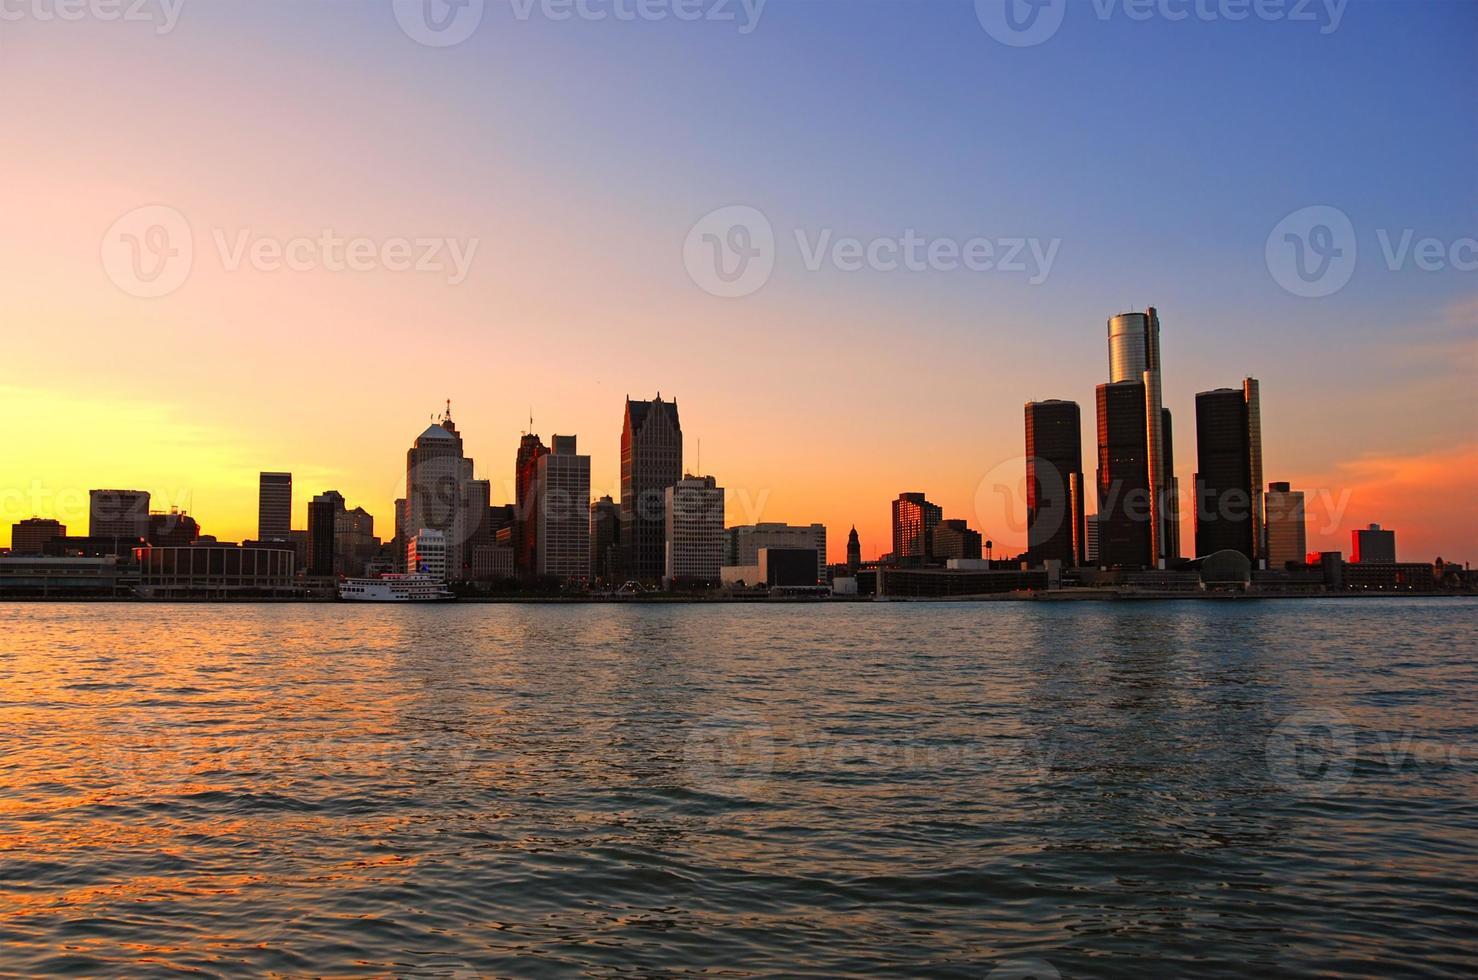 A beautiful sunset over a coastal city photo